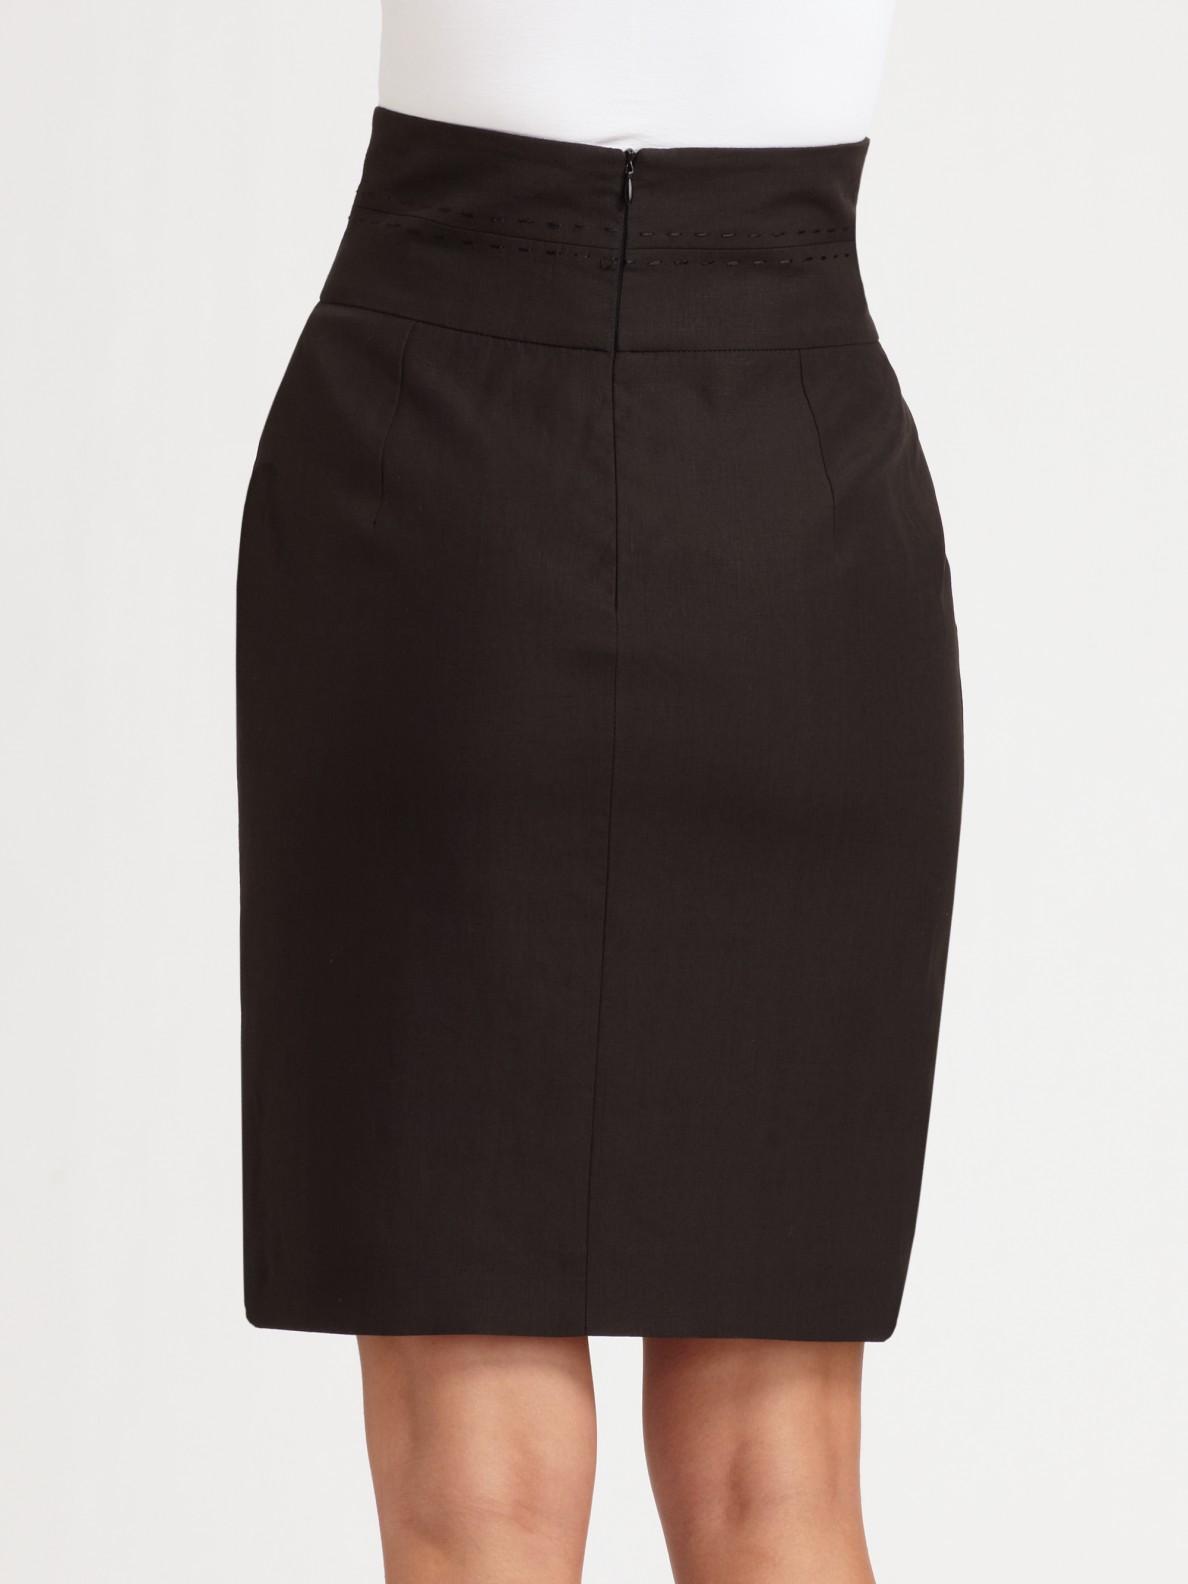 Armani Linen High Waisted Skirt in Black | Lyst